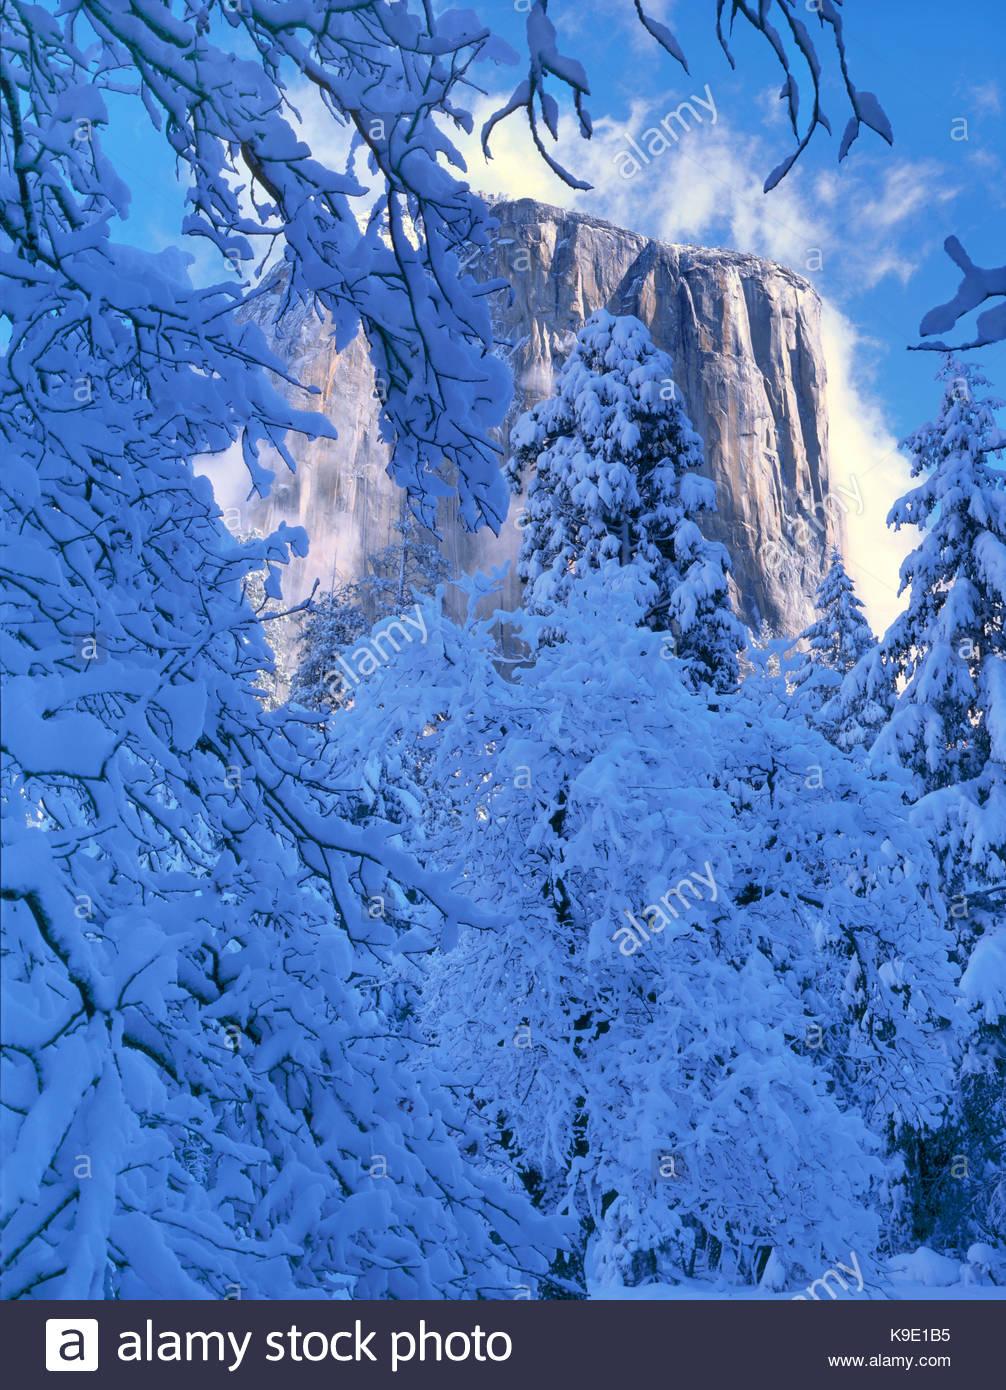 El Capitan after Snowstorm, Yosemite National Park, California - Stock Image